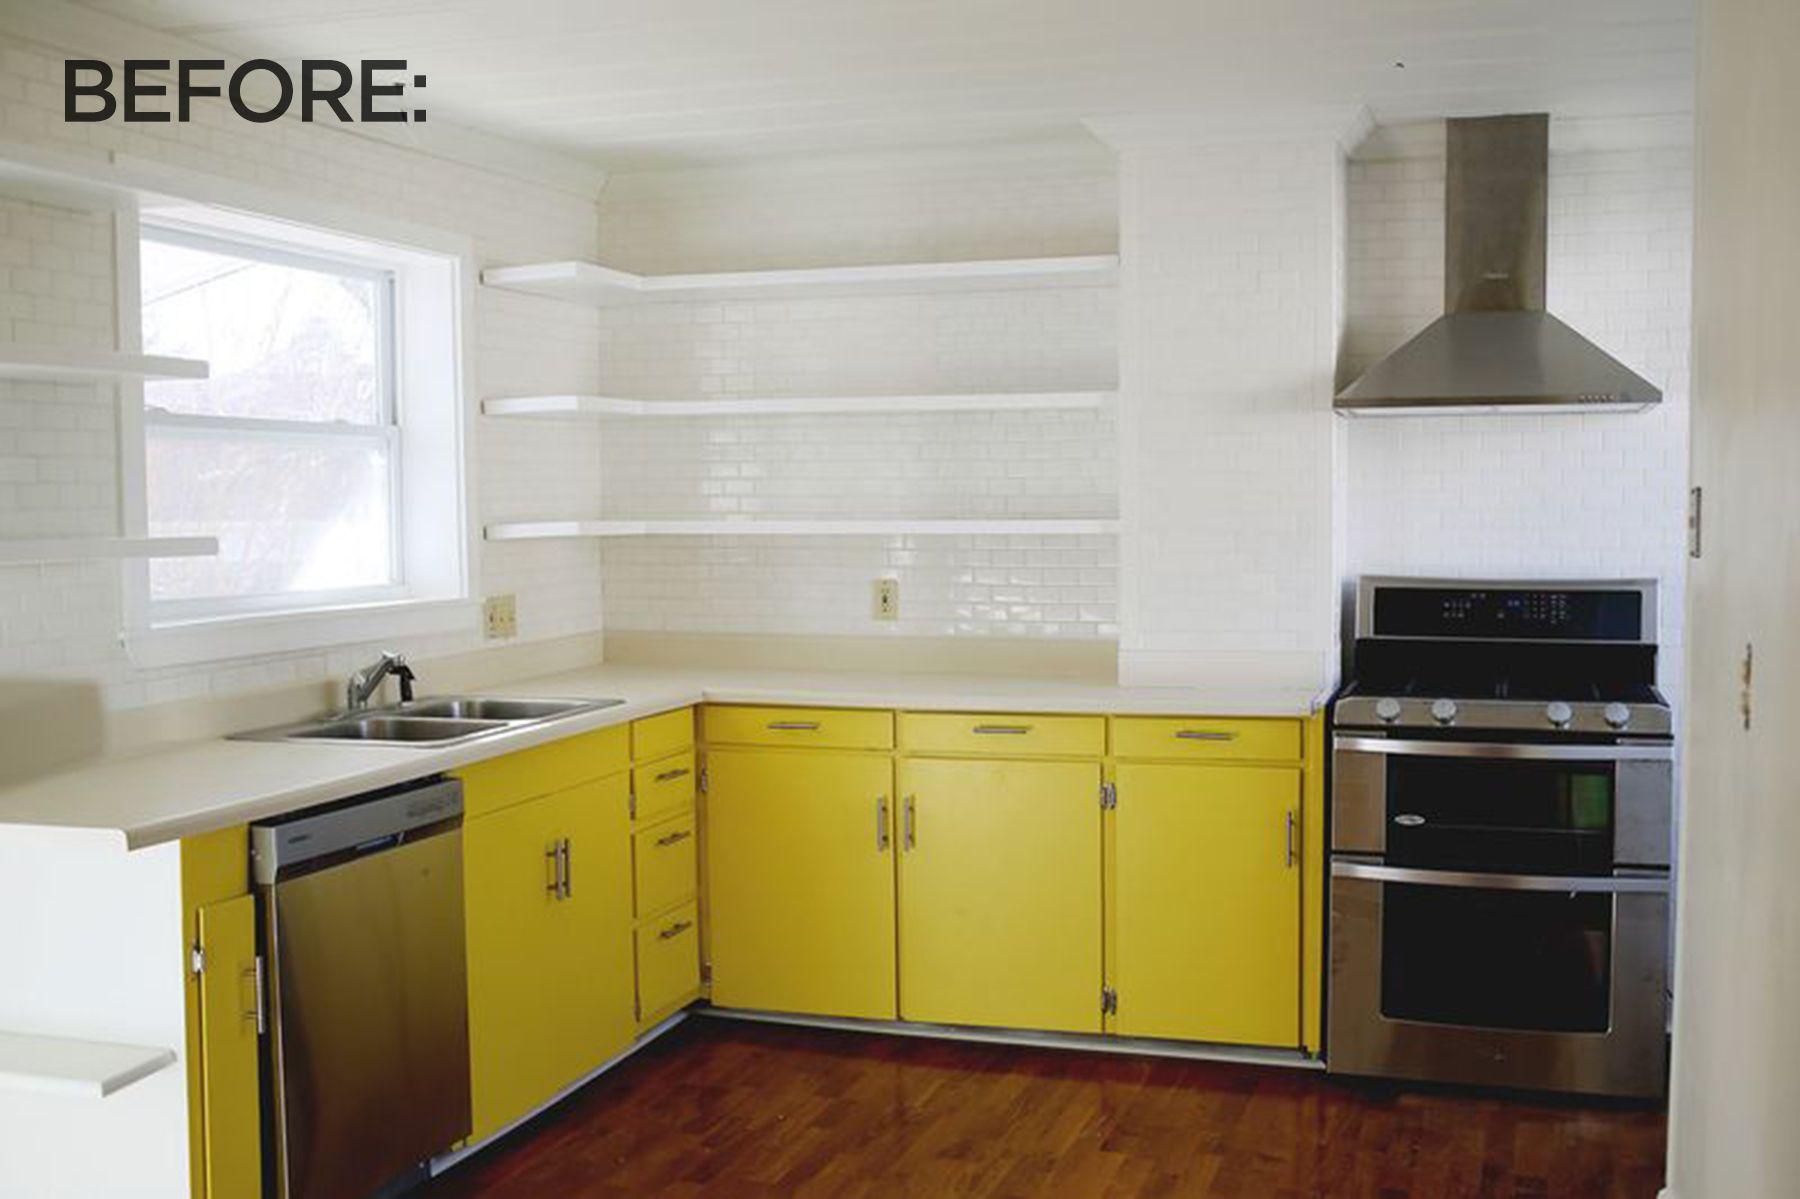 Concrete Countertop DIY abeautifulmess.com | Kitchens | Pinterest ...